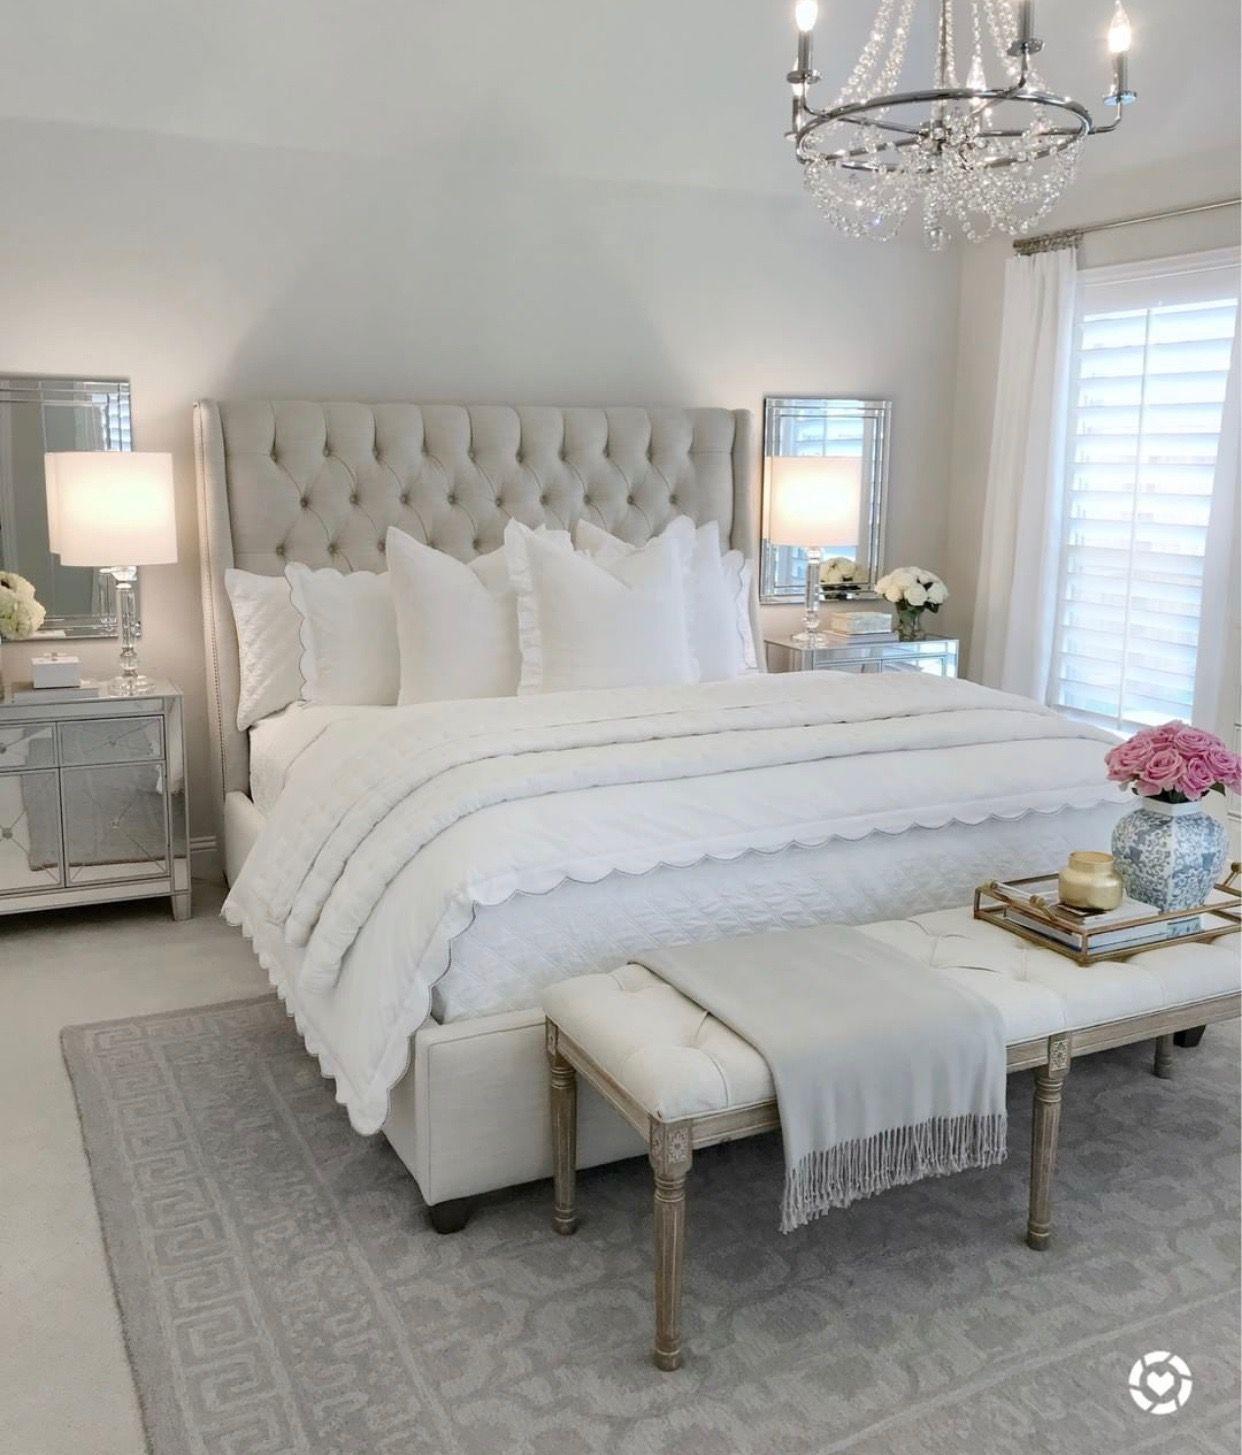 Bedroom  Master bedrooms decor, Home decor bedroom, Bedroom interior